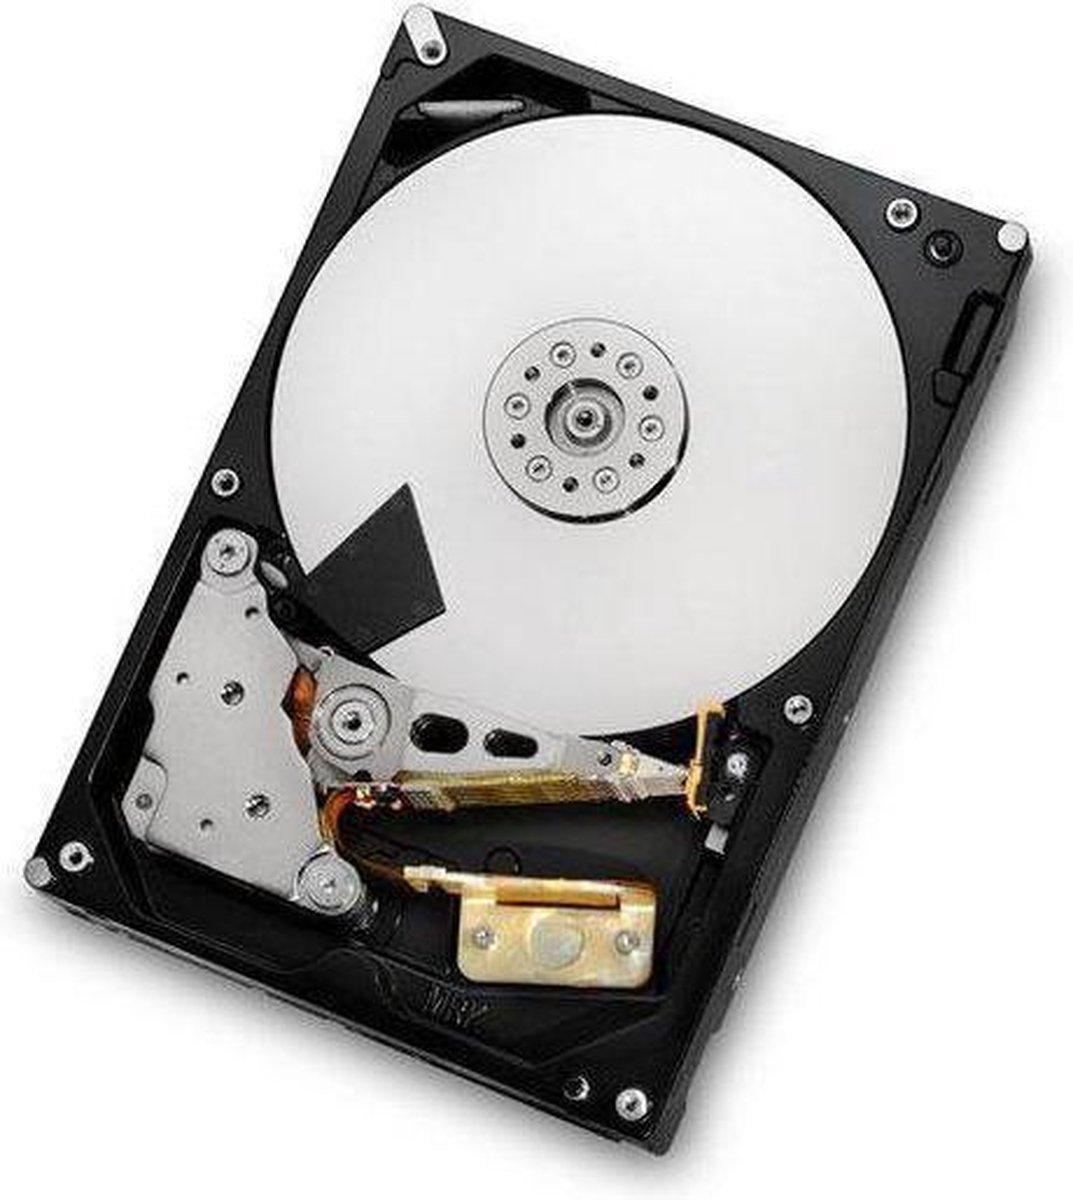 HGST interne harde schijven 7K3000 3TB SATA kopen